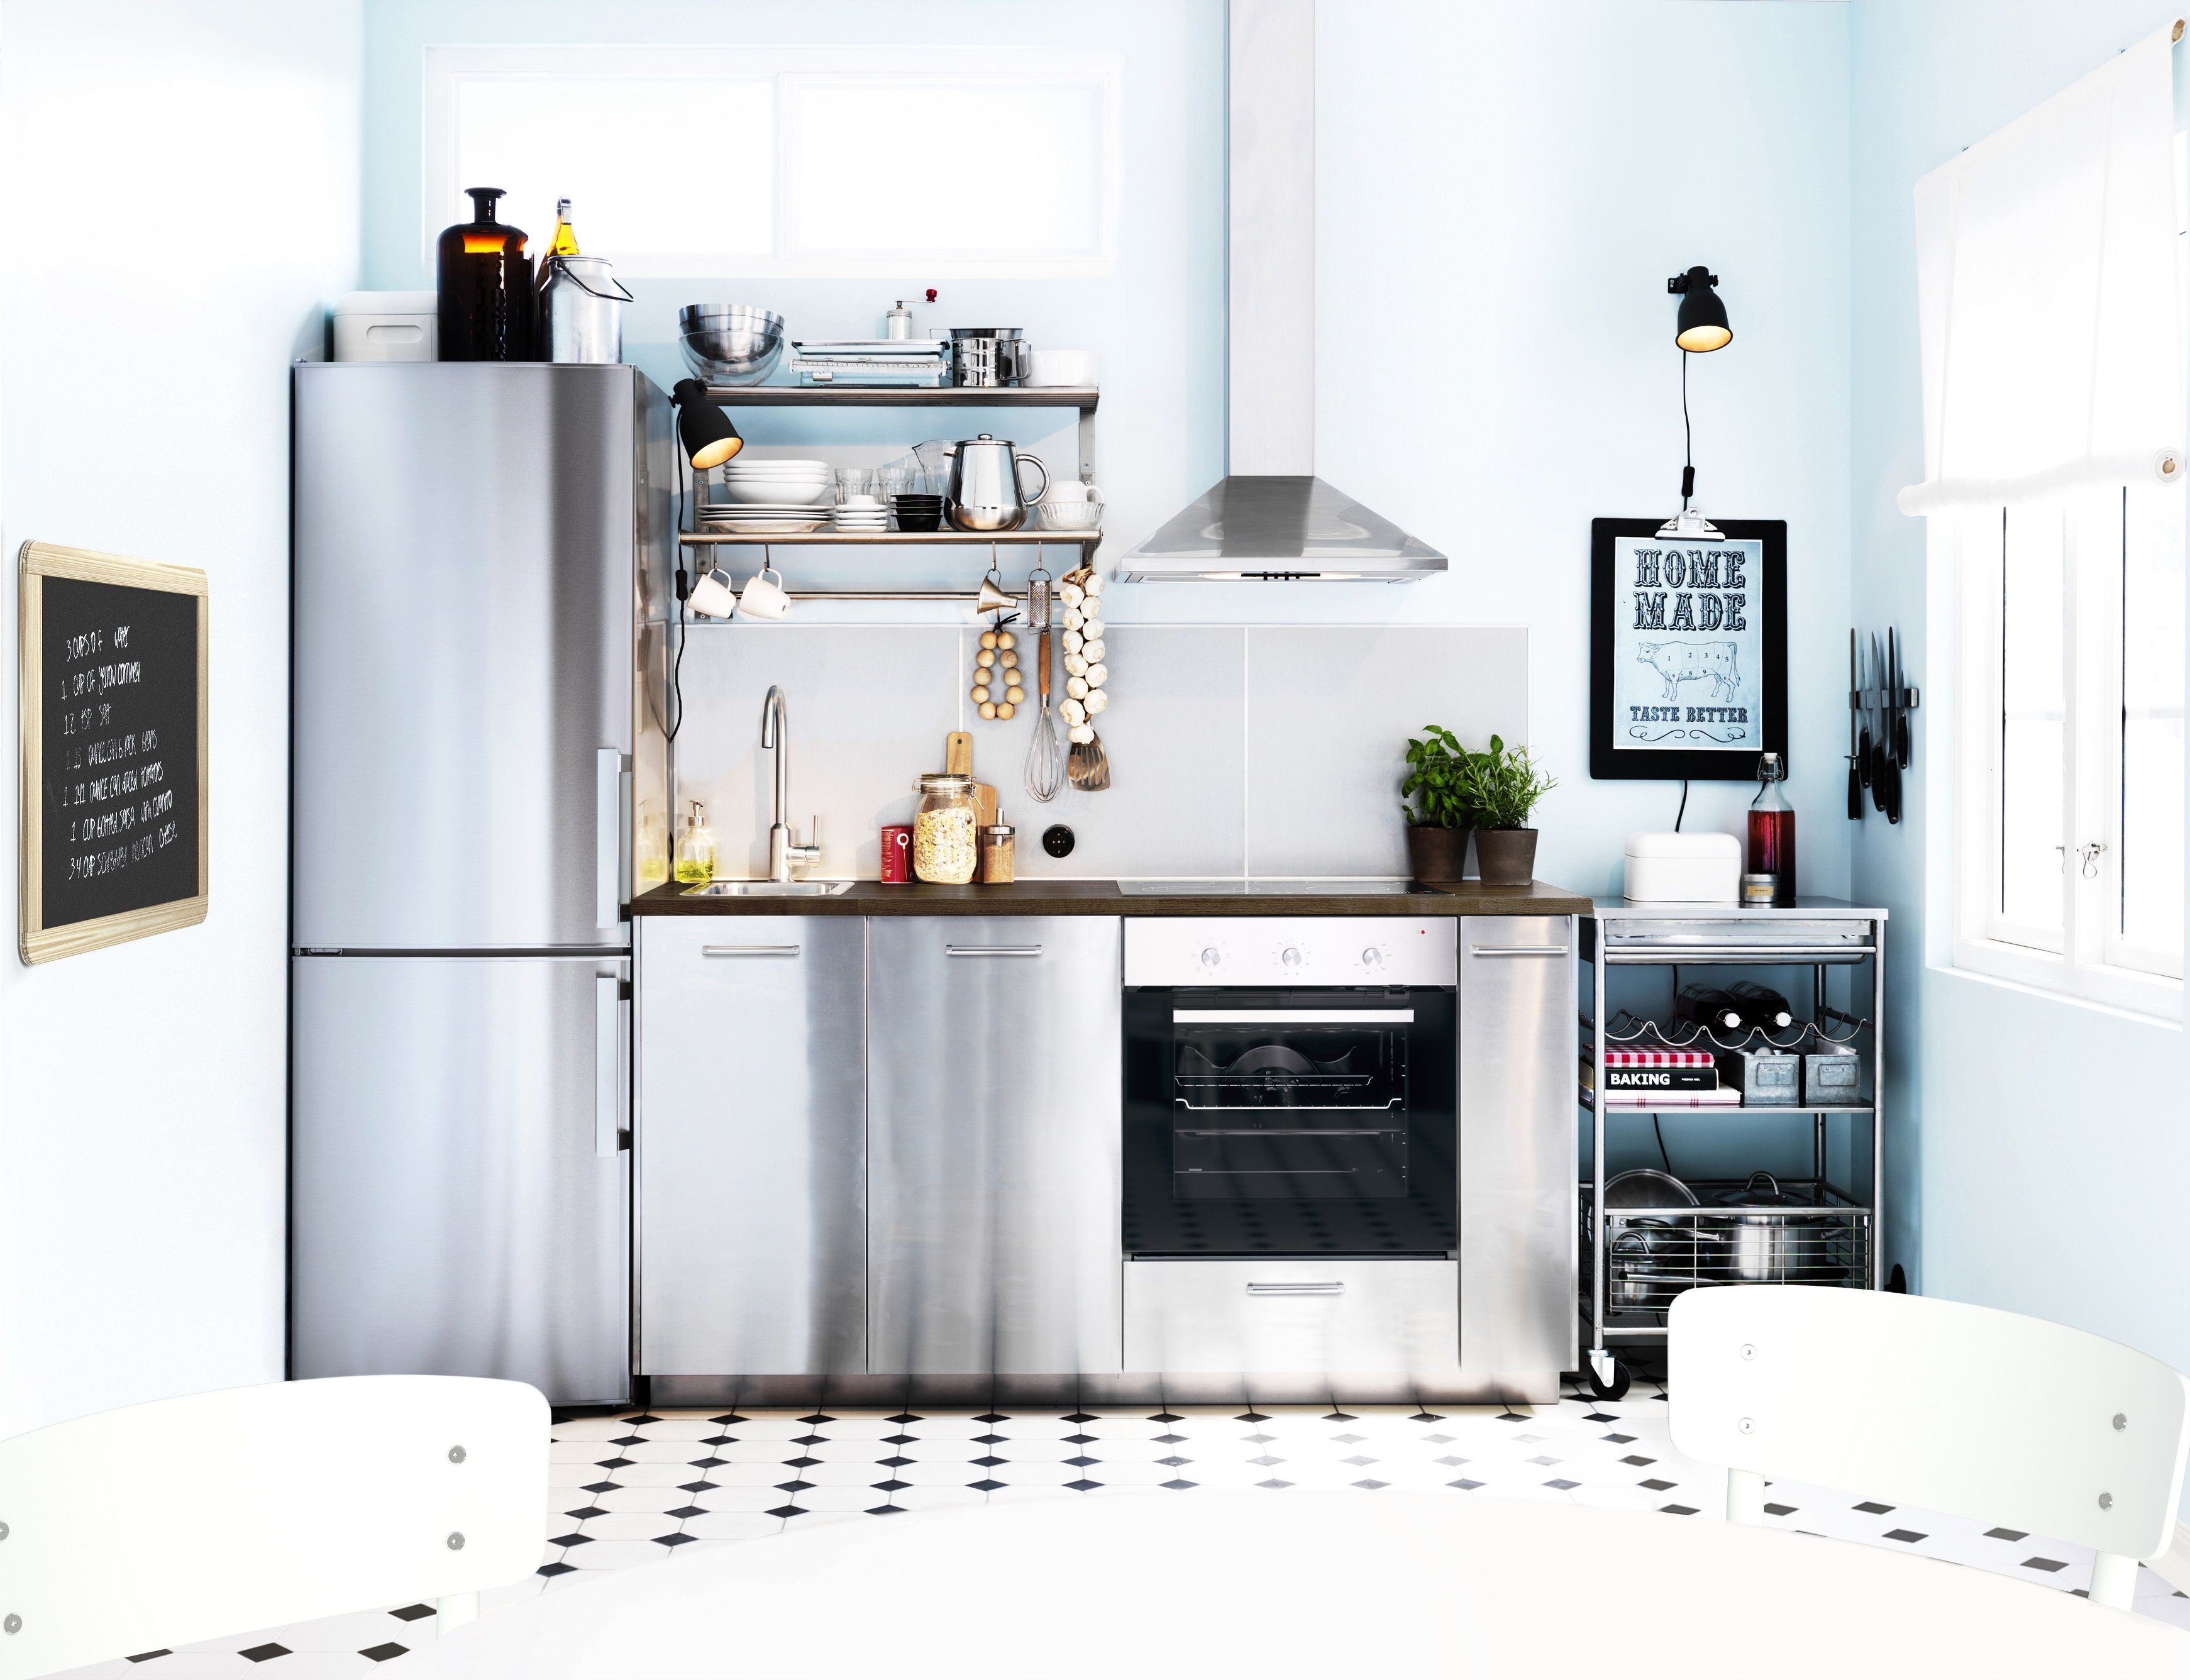 Keuken Ikea Stoere : Onze nieuwe keuken livelovehome